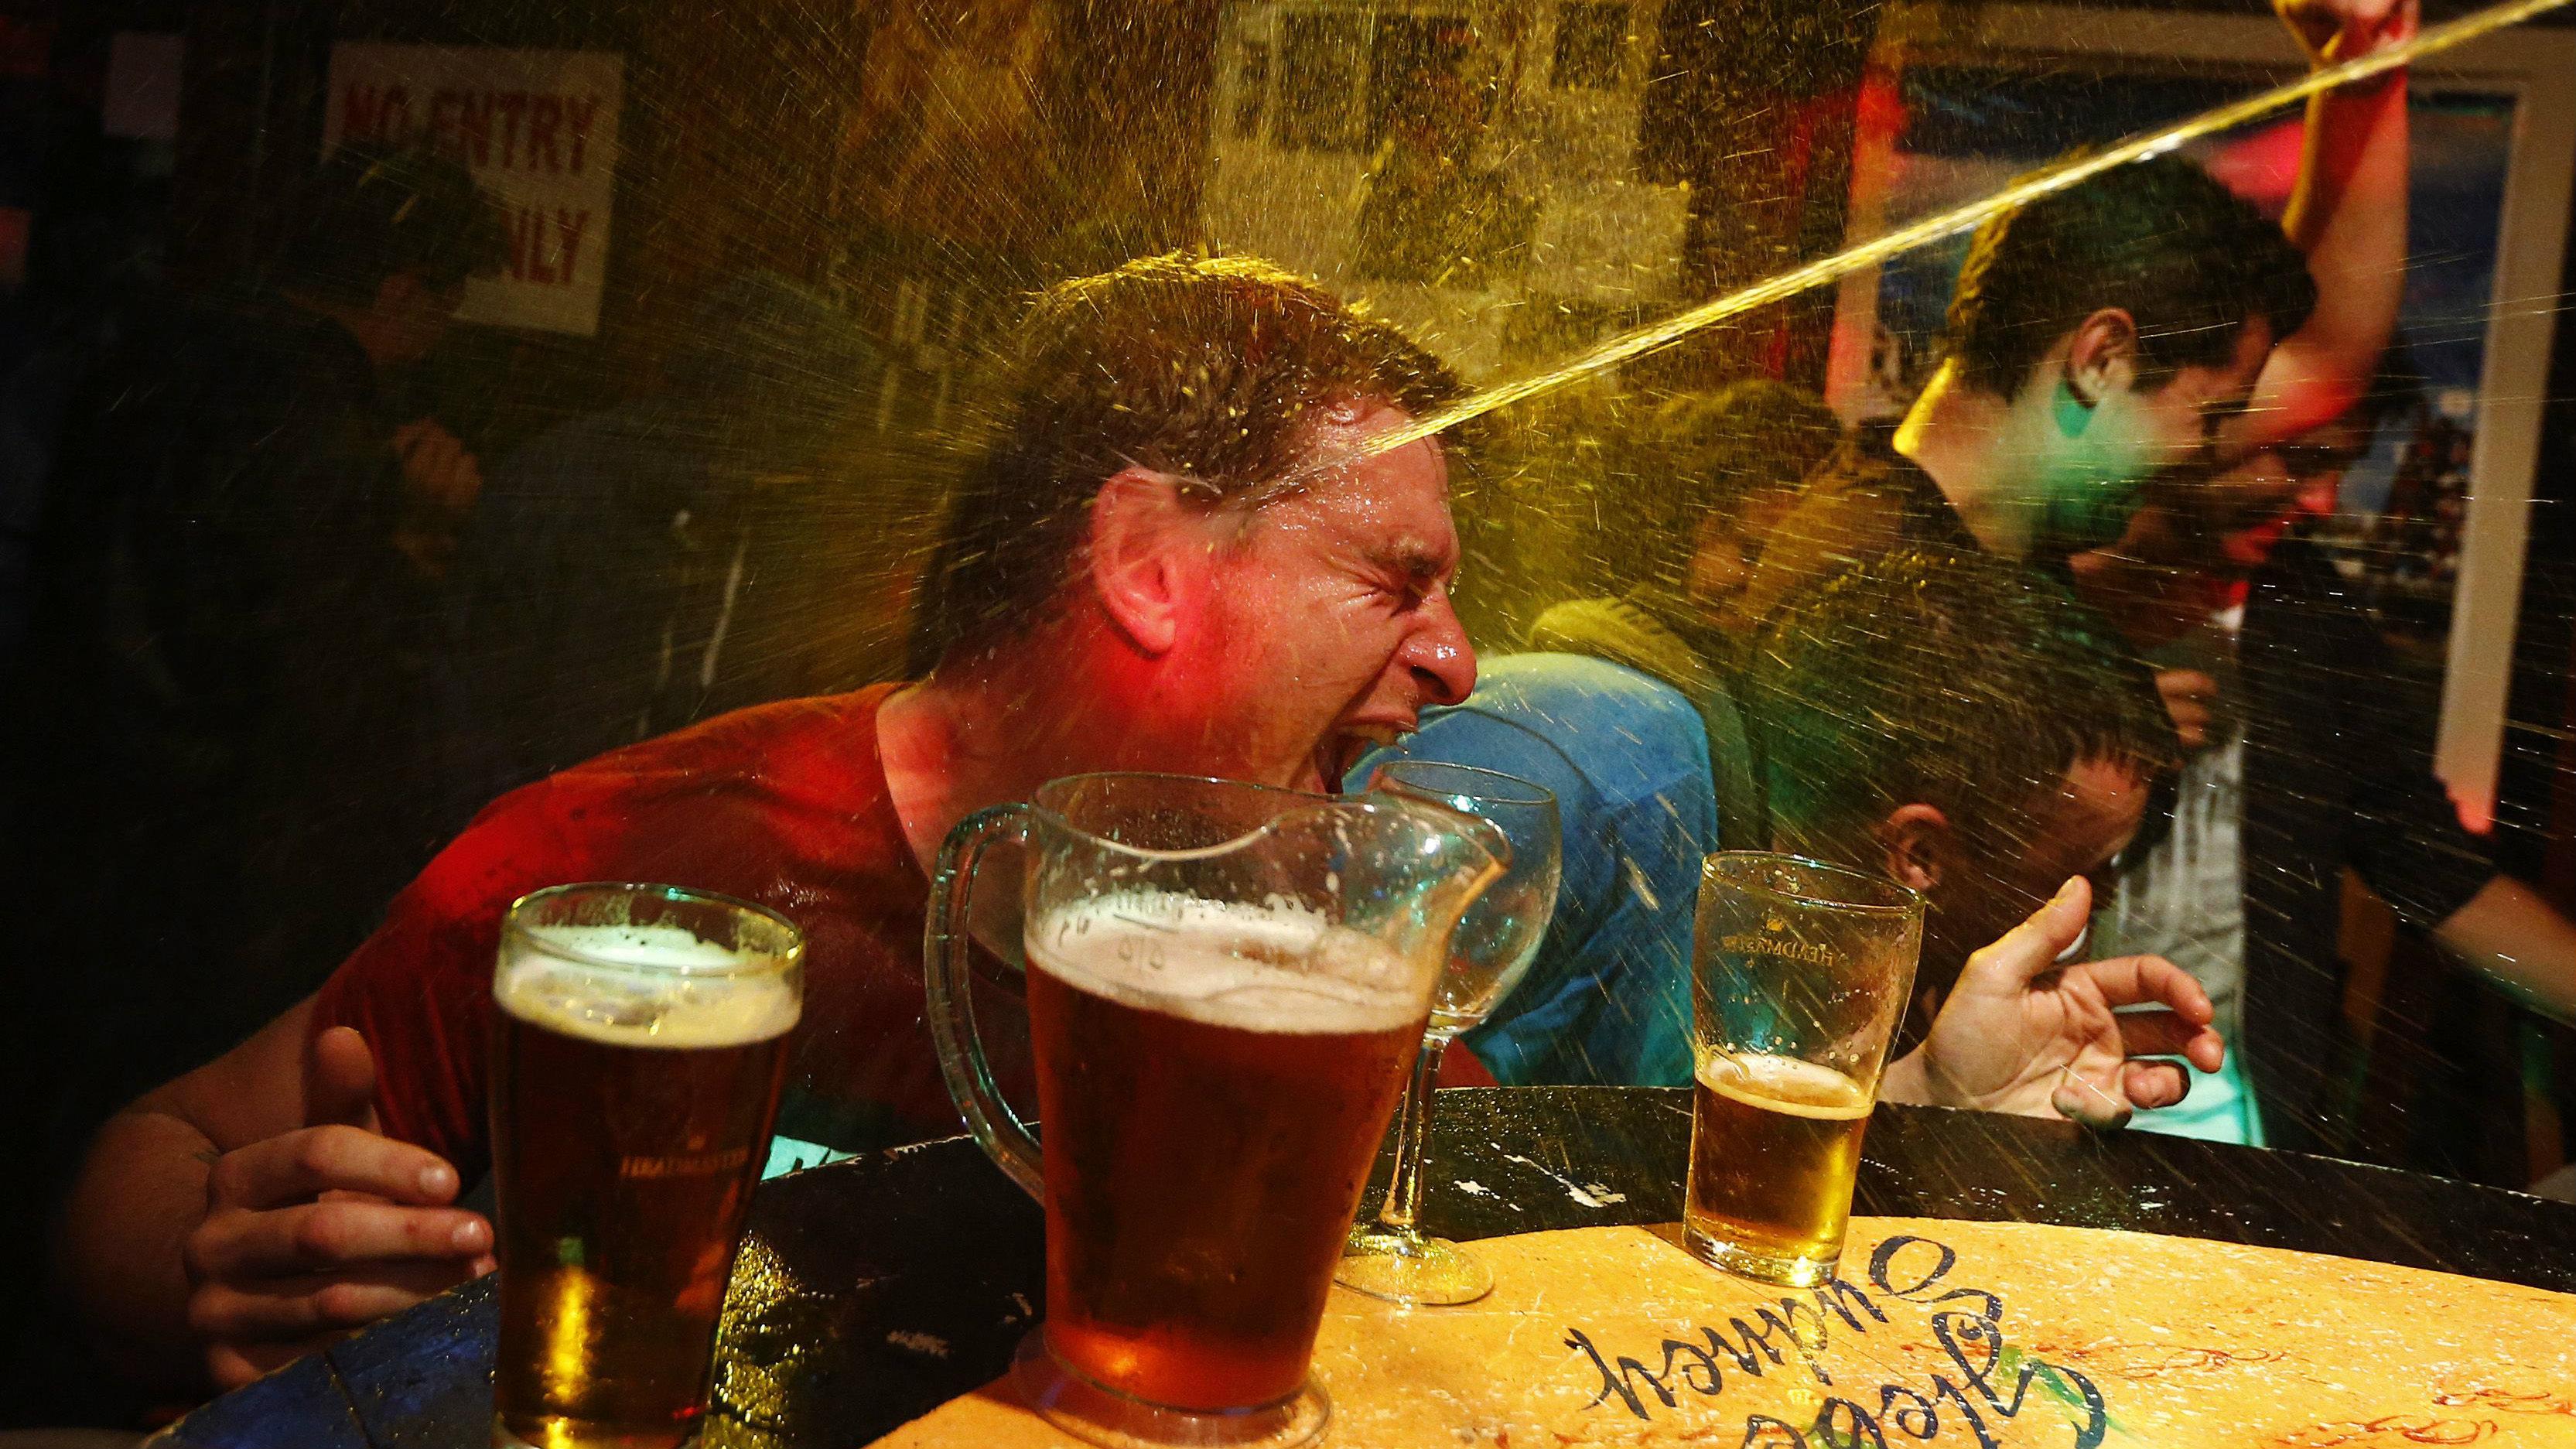 drunk-post-facebook-prevent